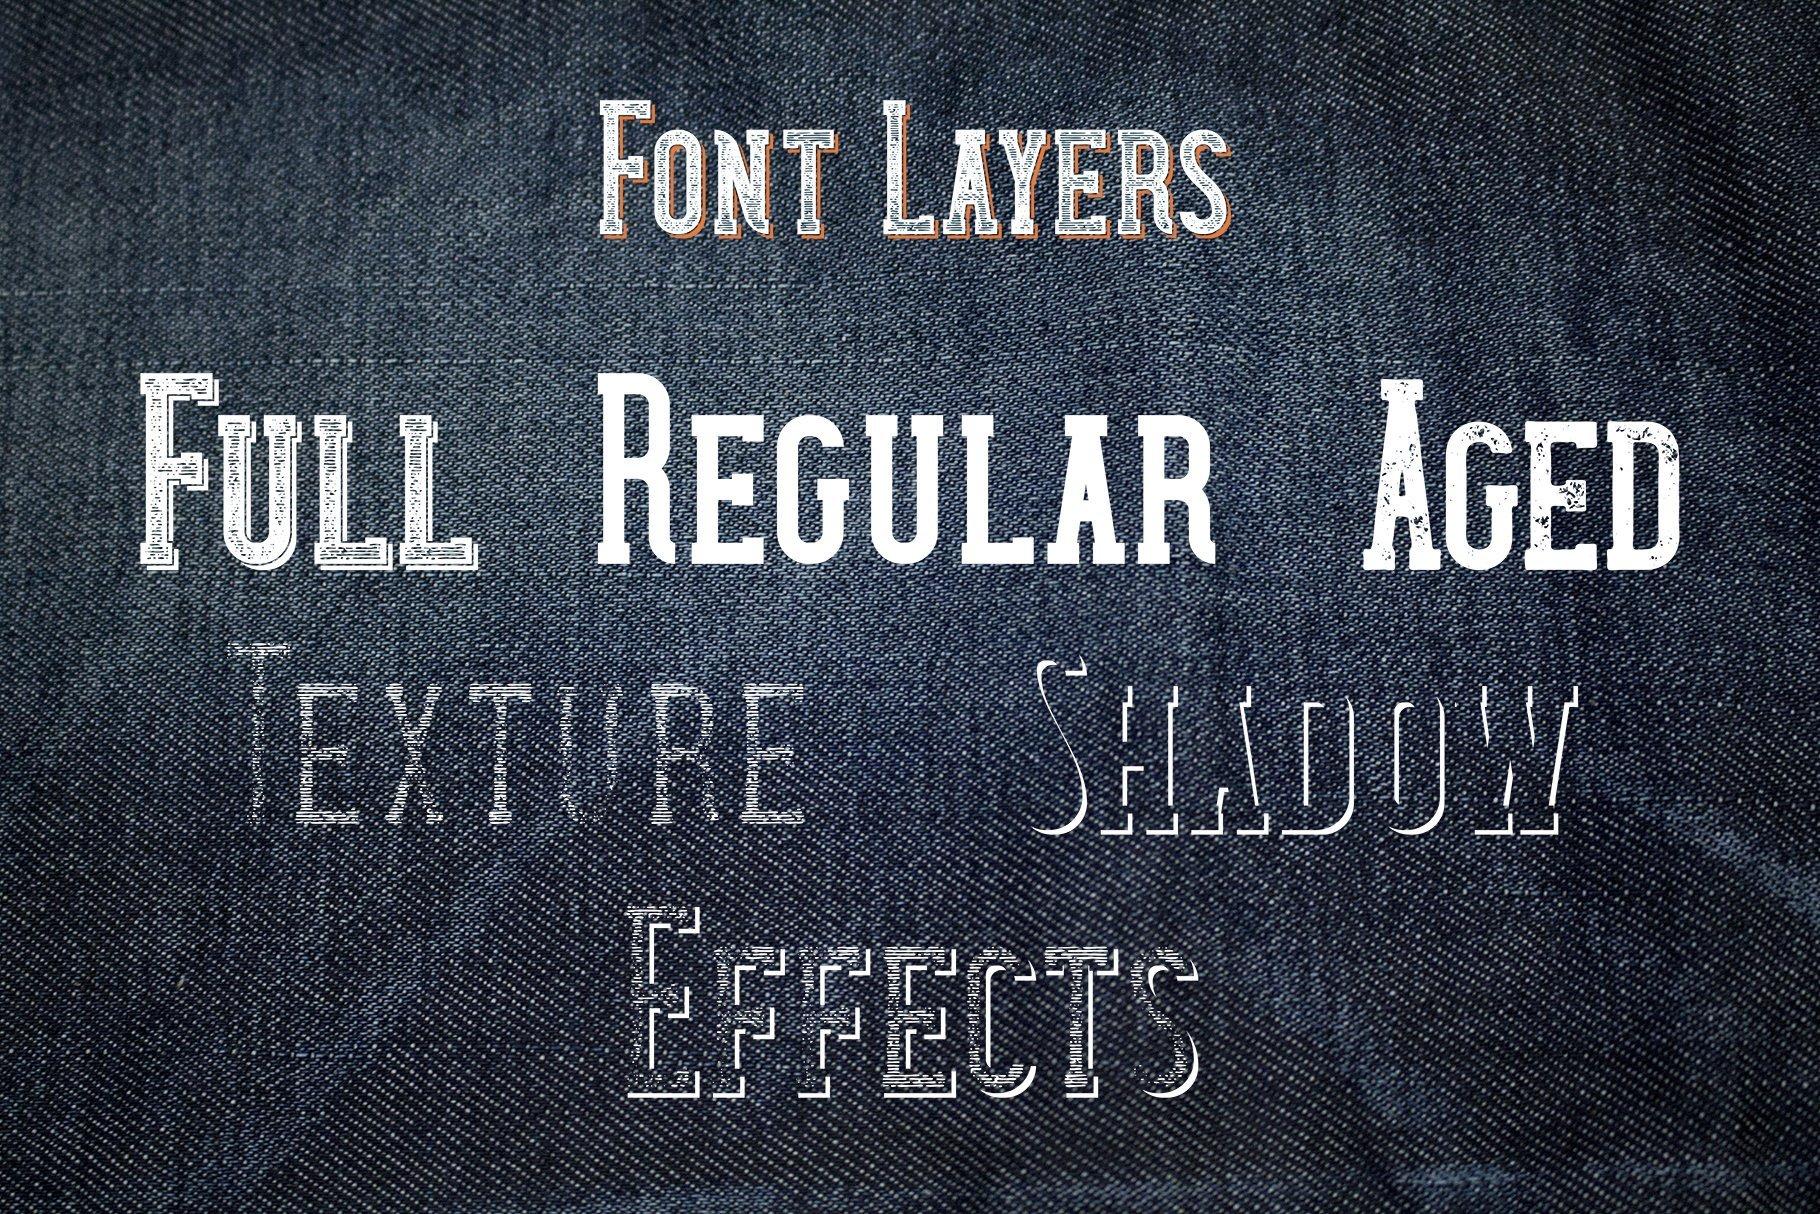 Denim font layers.